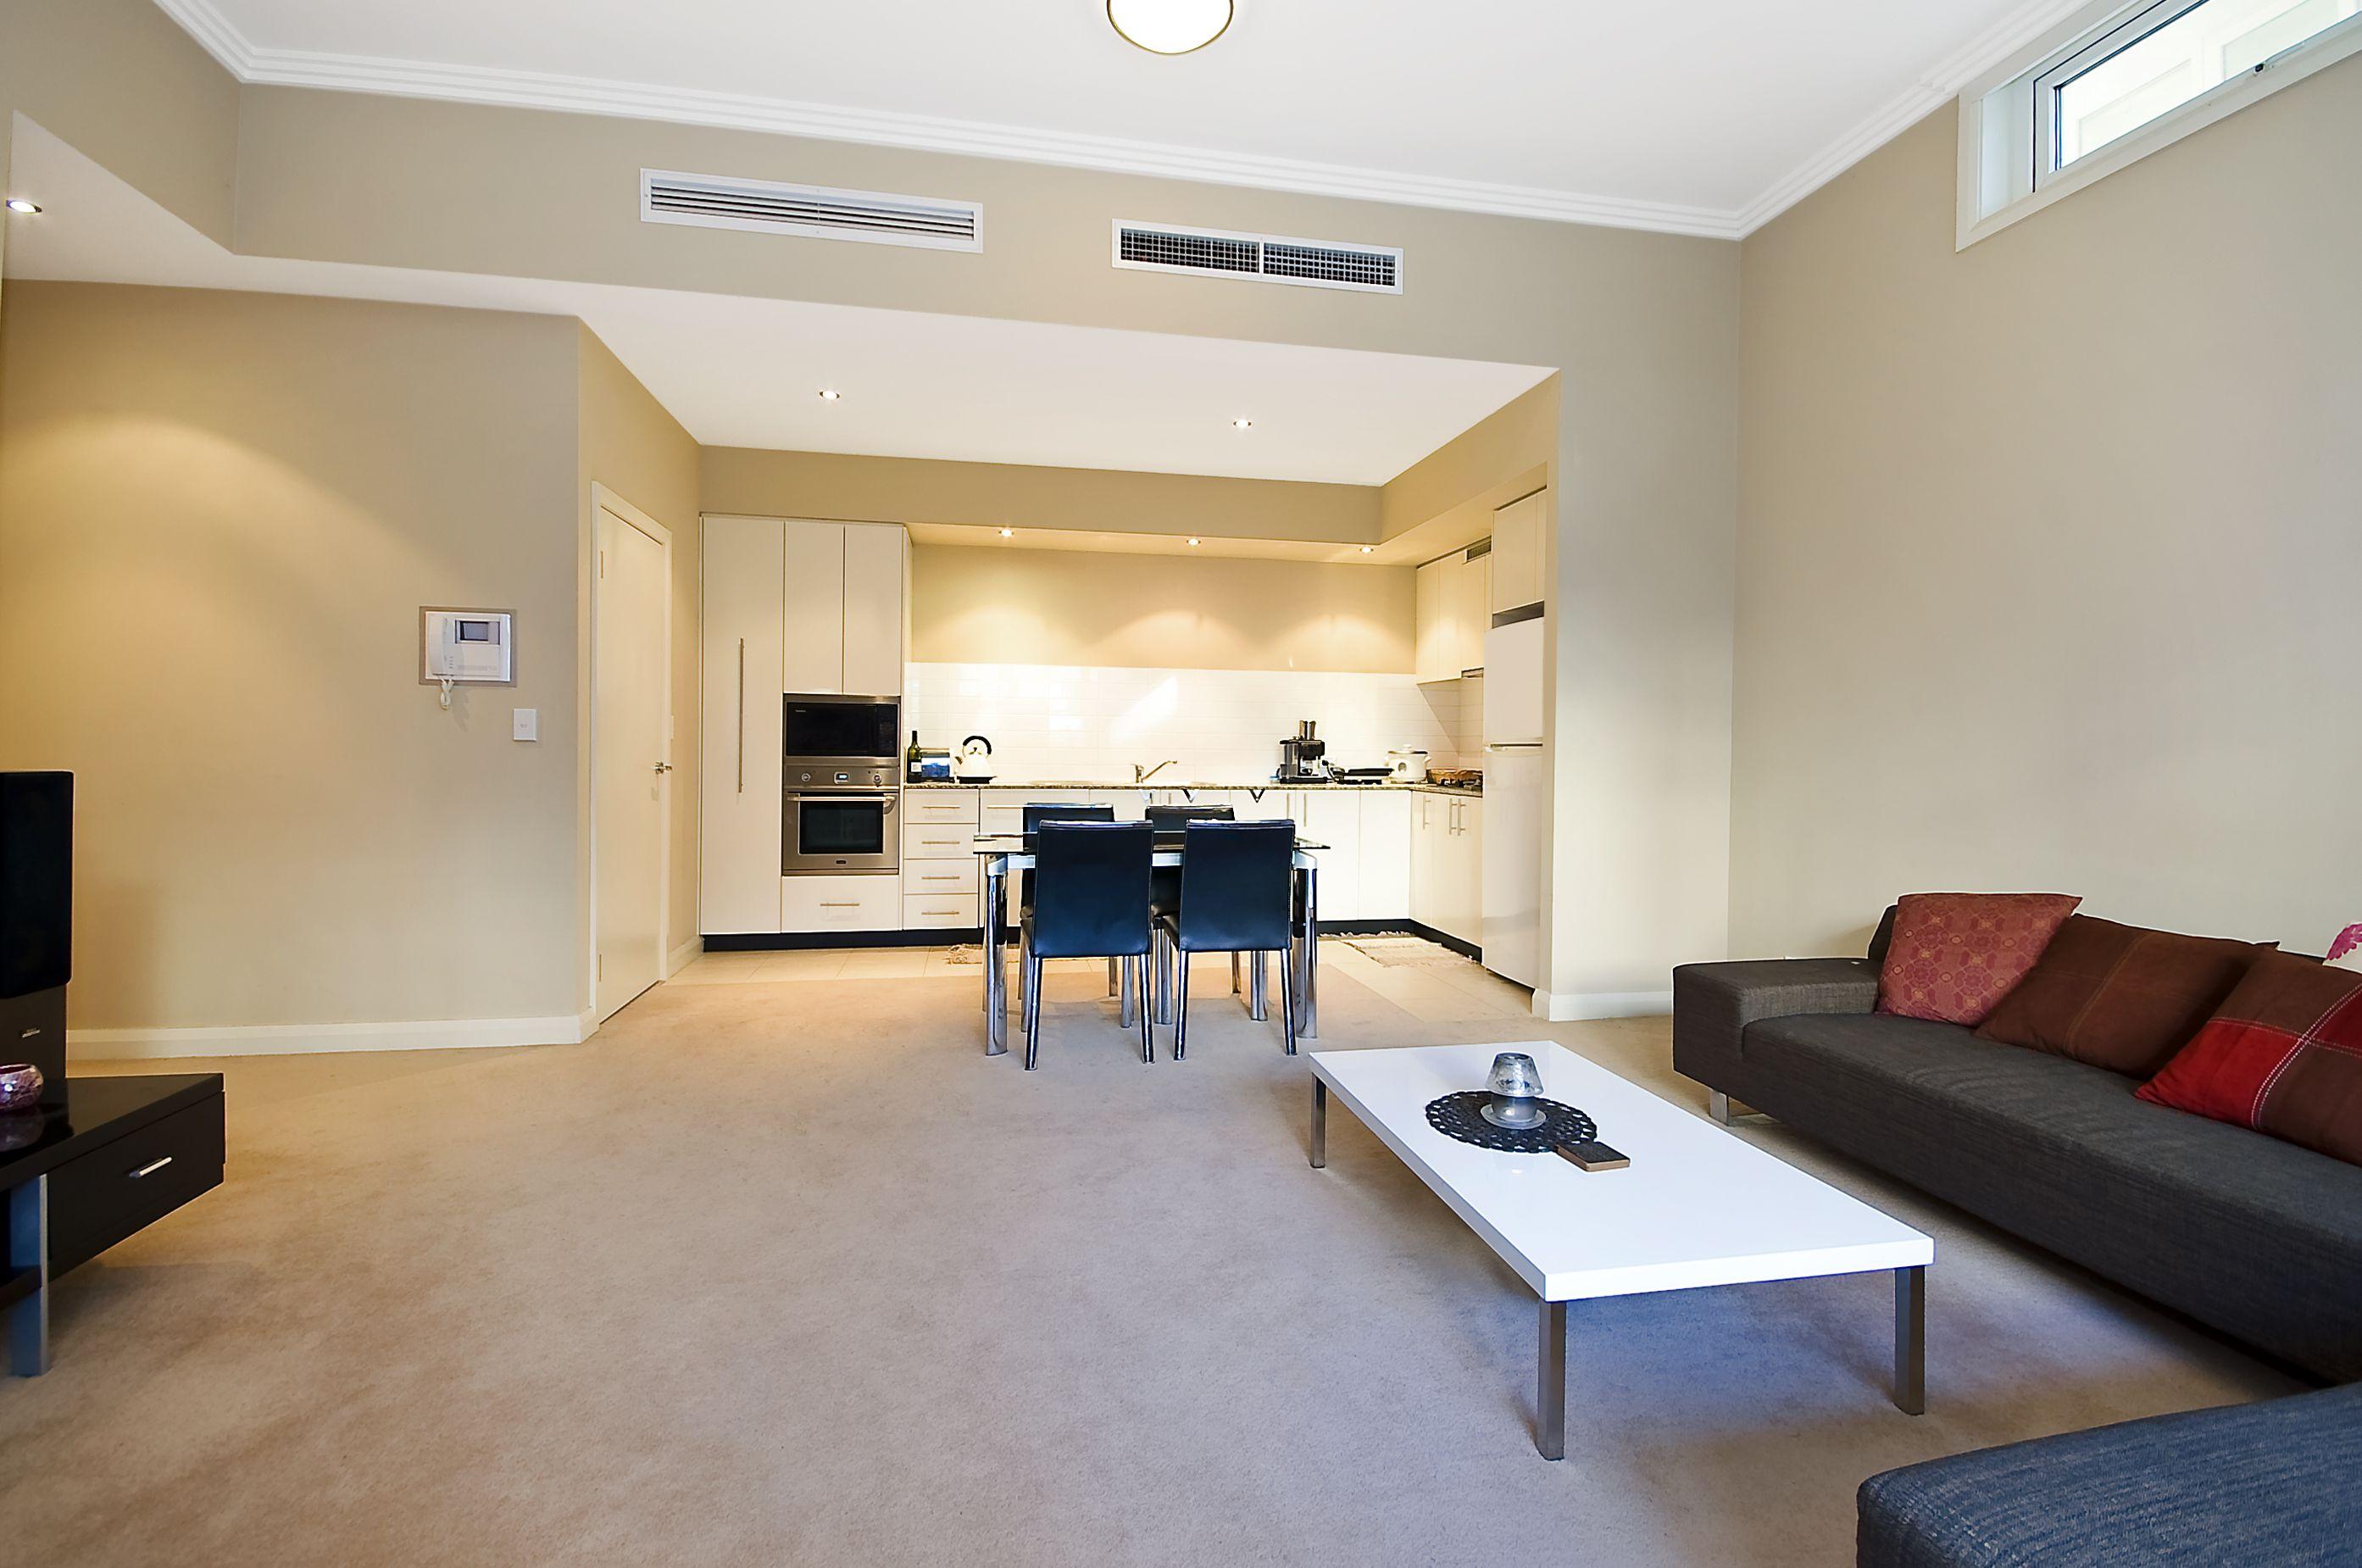 43/25 Angas Street, Meadowbank NSW 2114